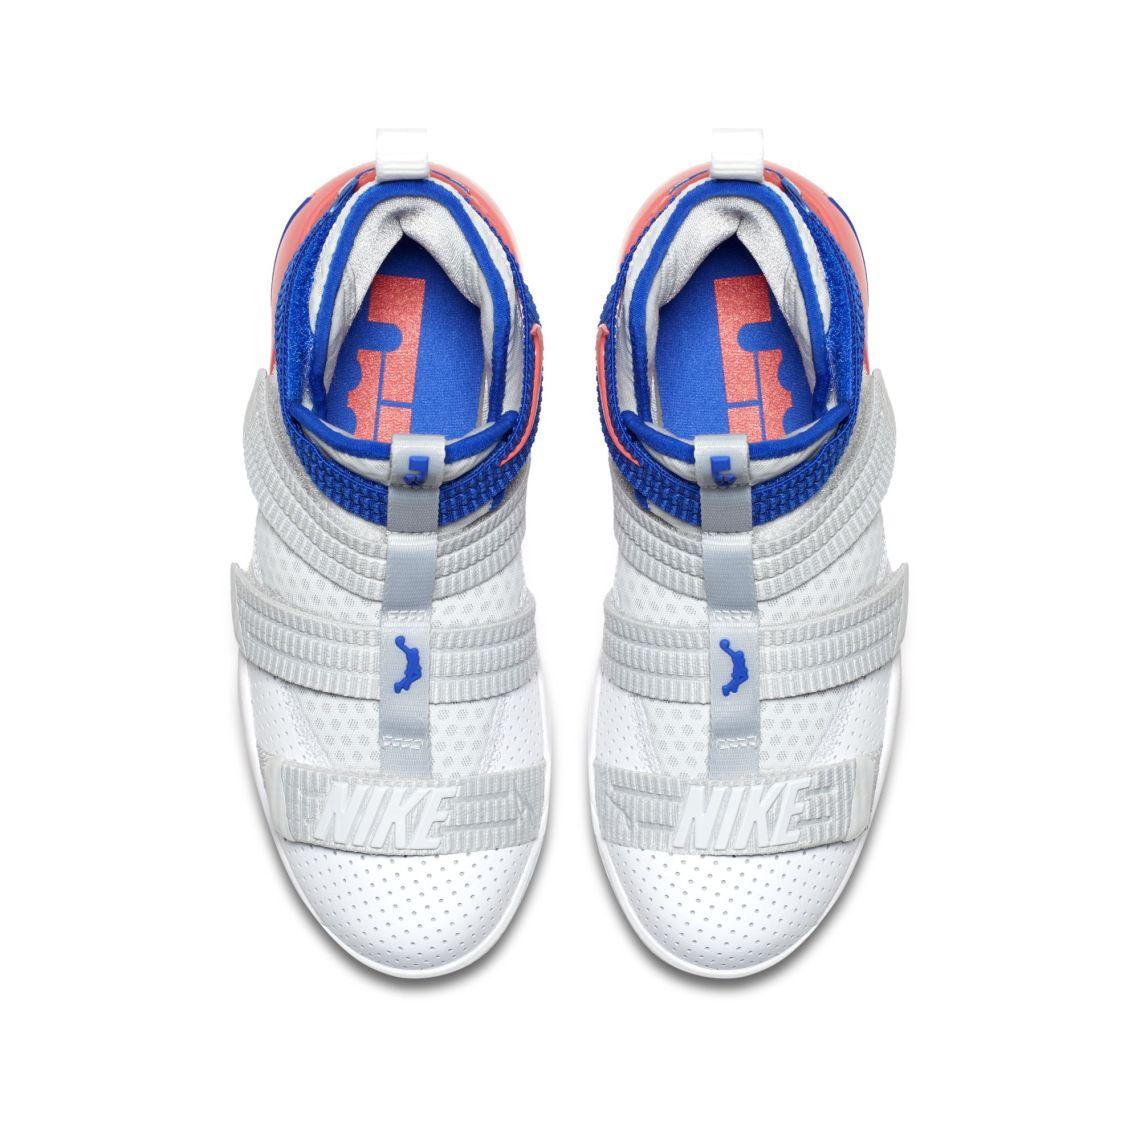 "Nike LeBron Soldier 11 GS ""Knicks"""